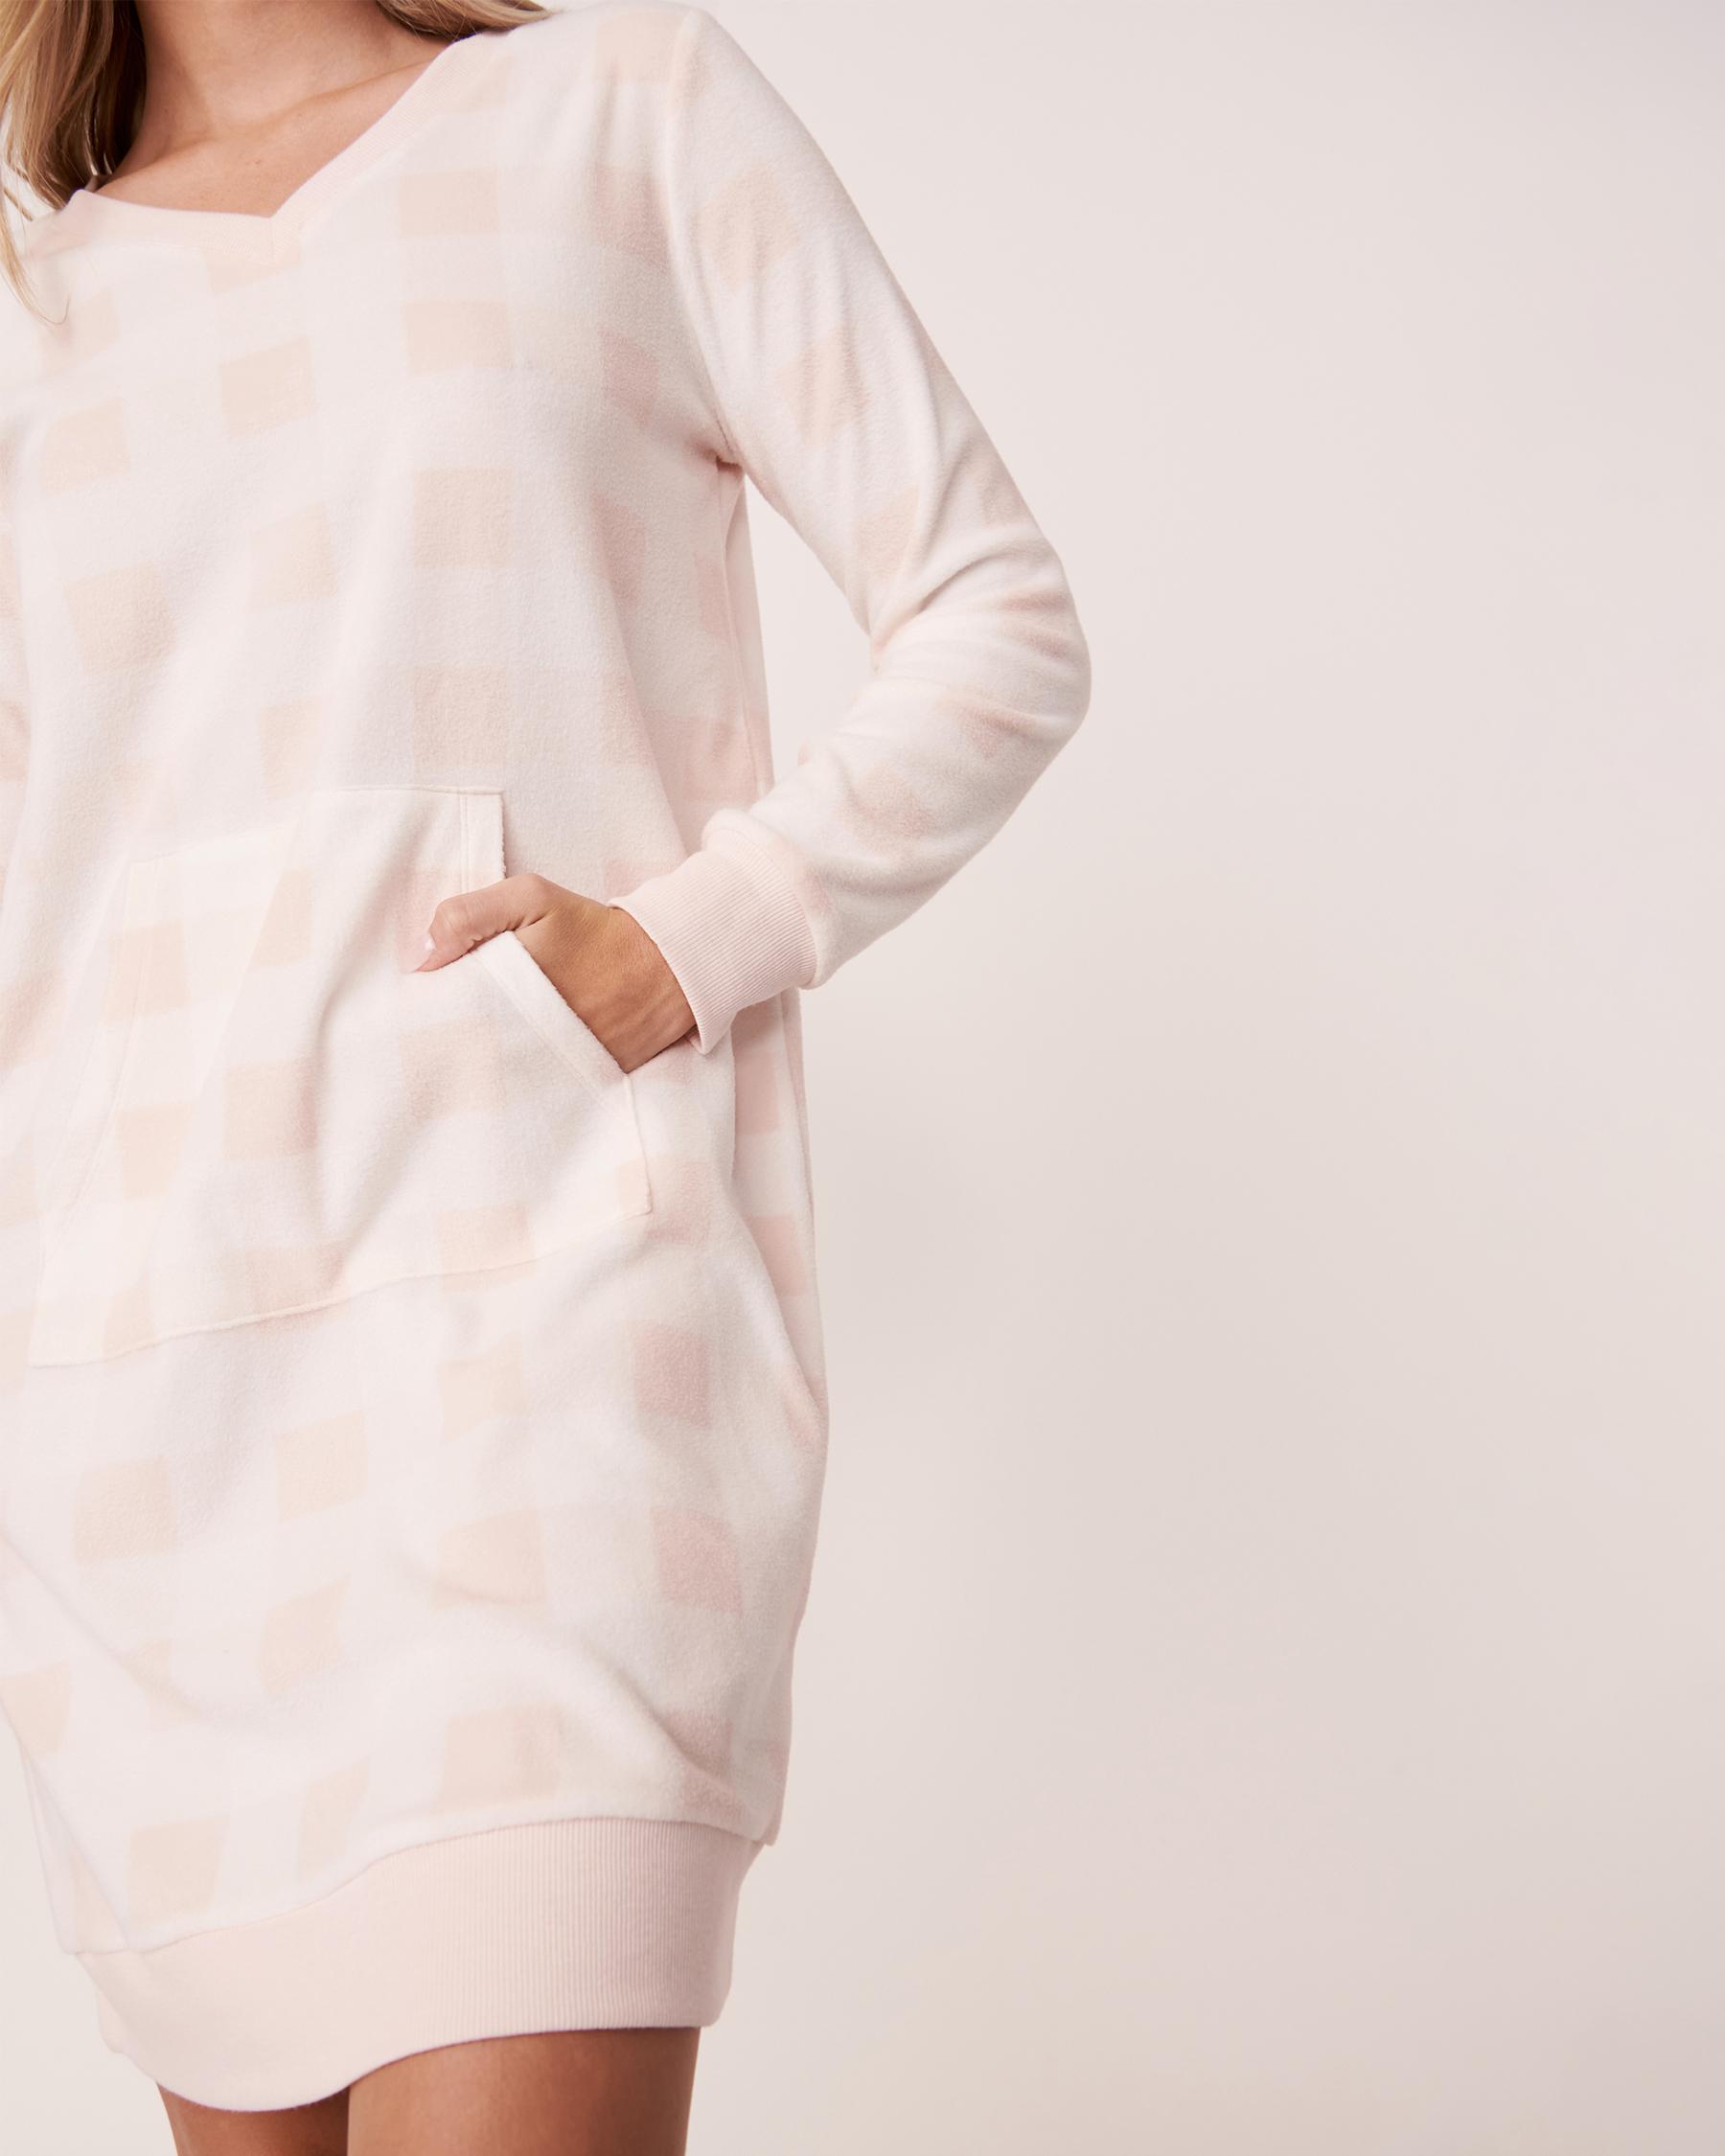 LA VIE EN ROSE Micropolar Long Sleeve Sleepshirt Pink vichy plaid 40500098 - View4